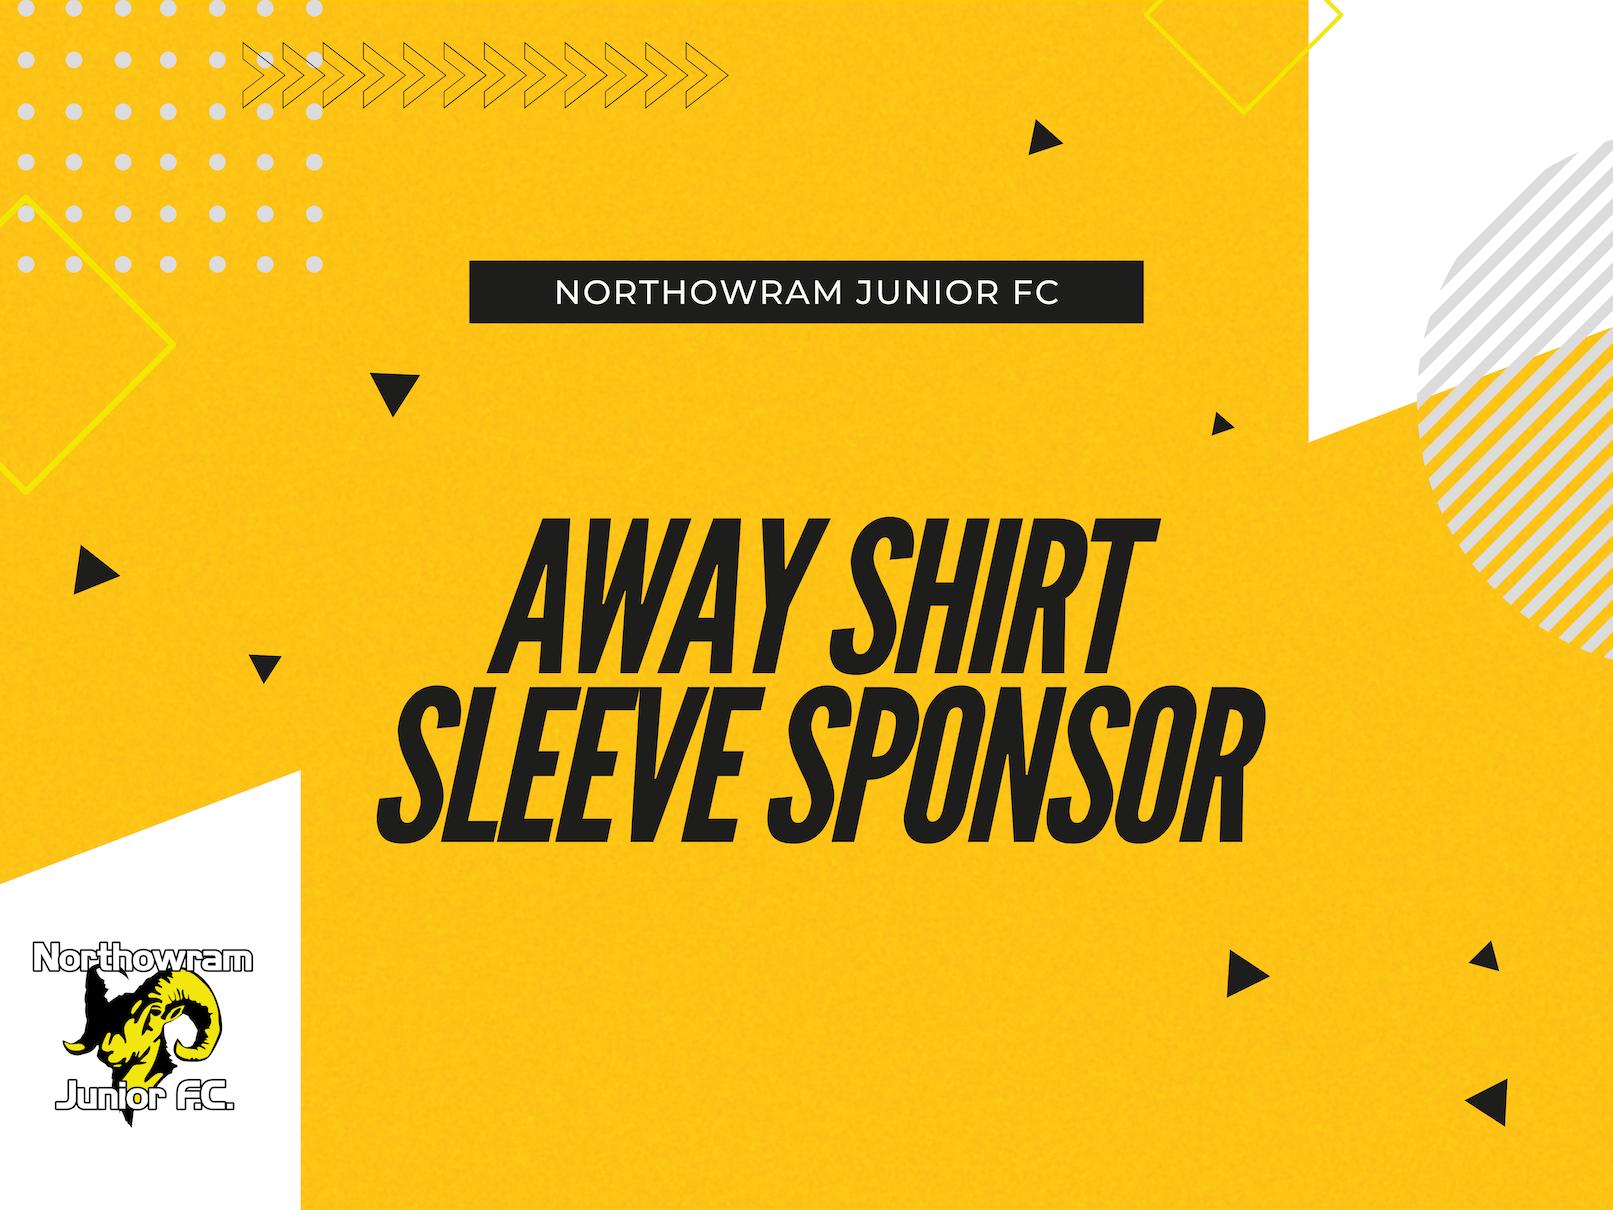 Away Shirt Sleeve Sponsor